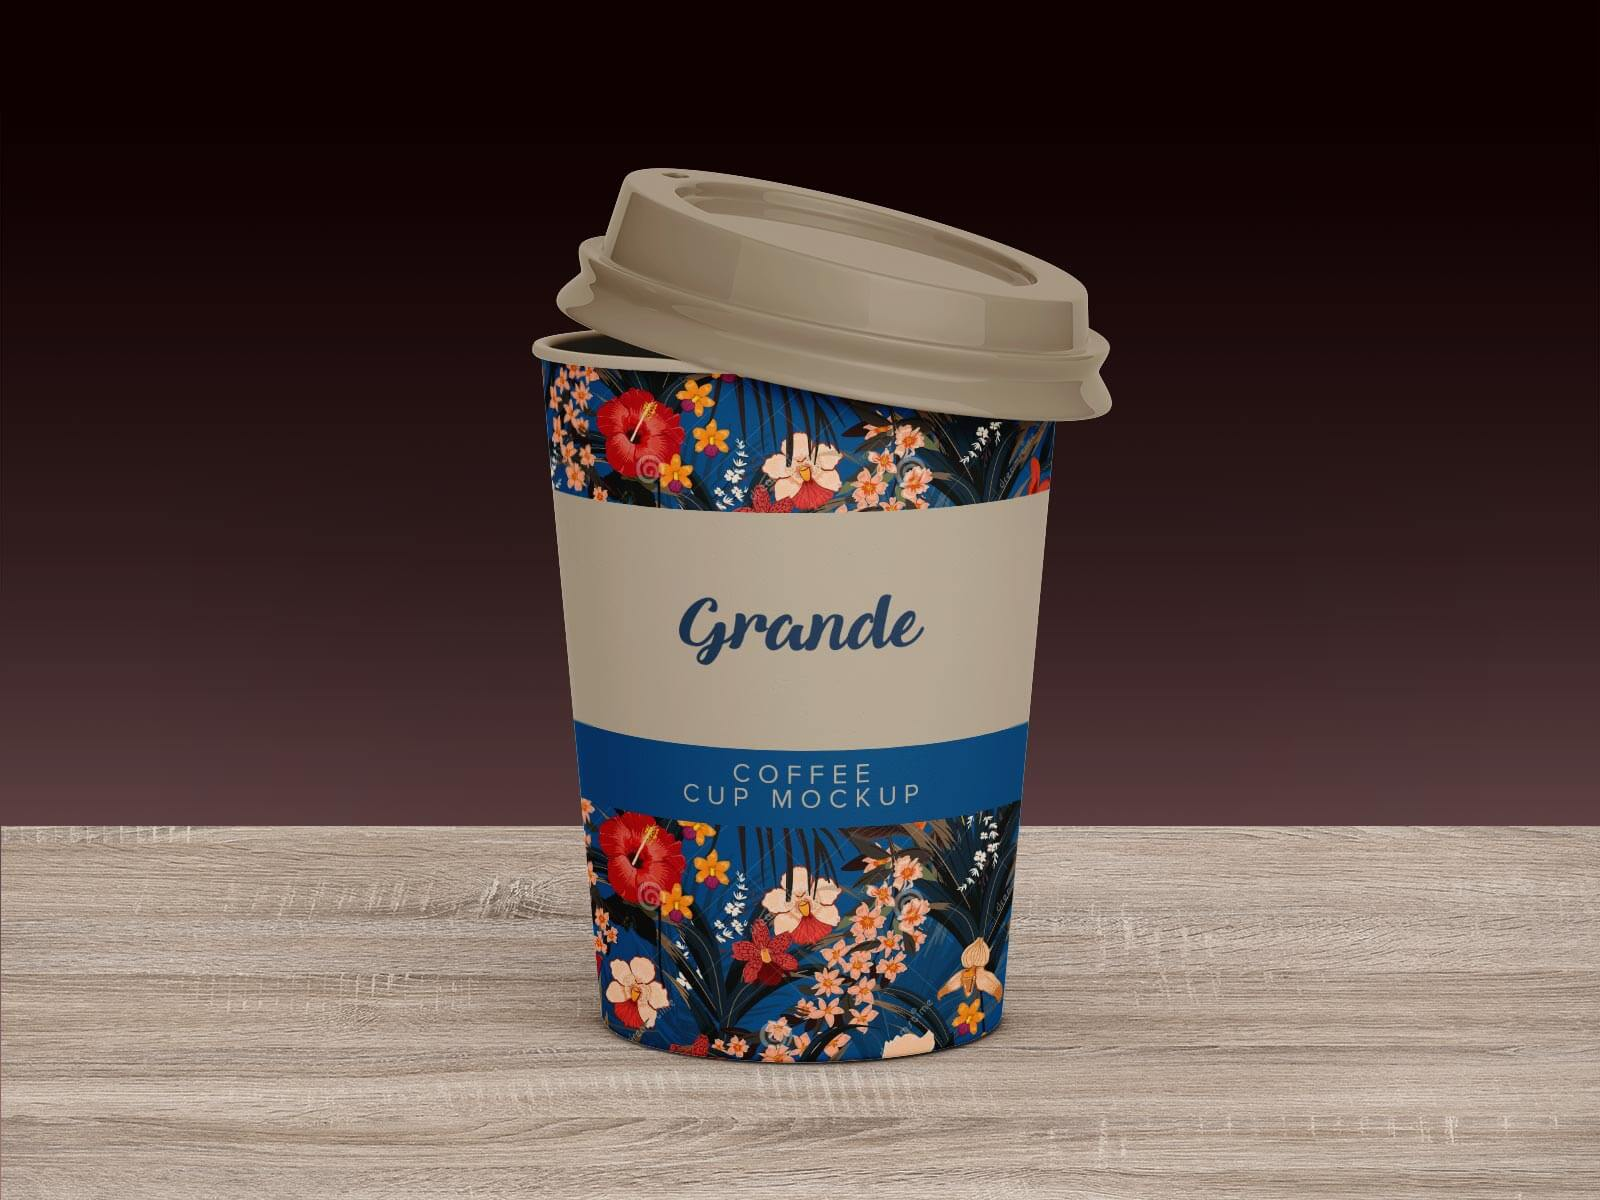 Free Venti, Grande & Short Paper Coffee Cup Mockup PSD Set (2)